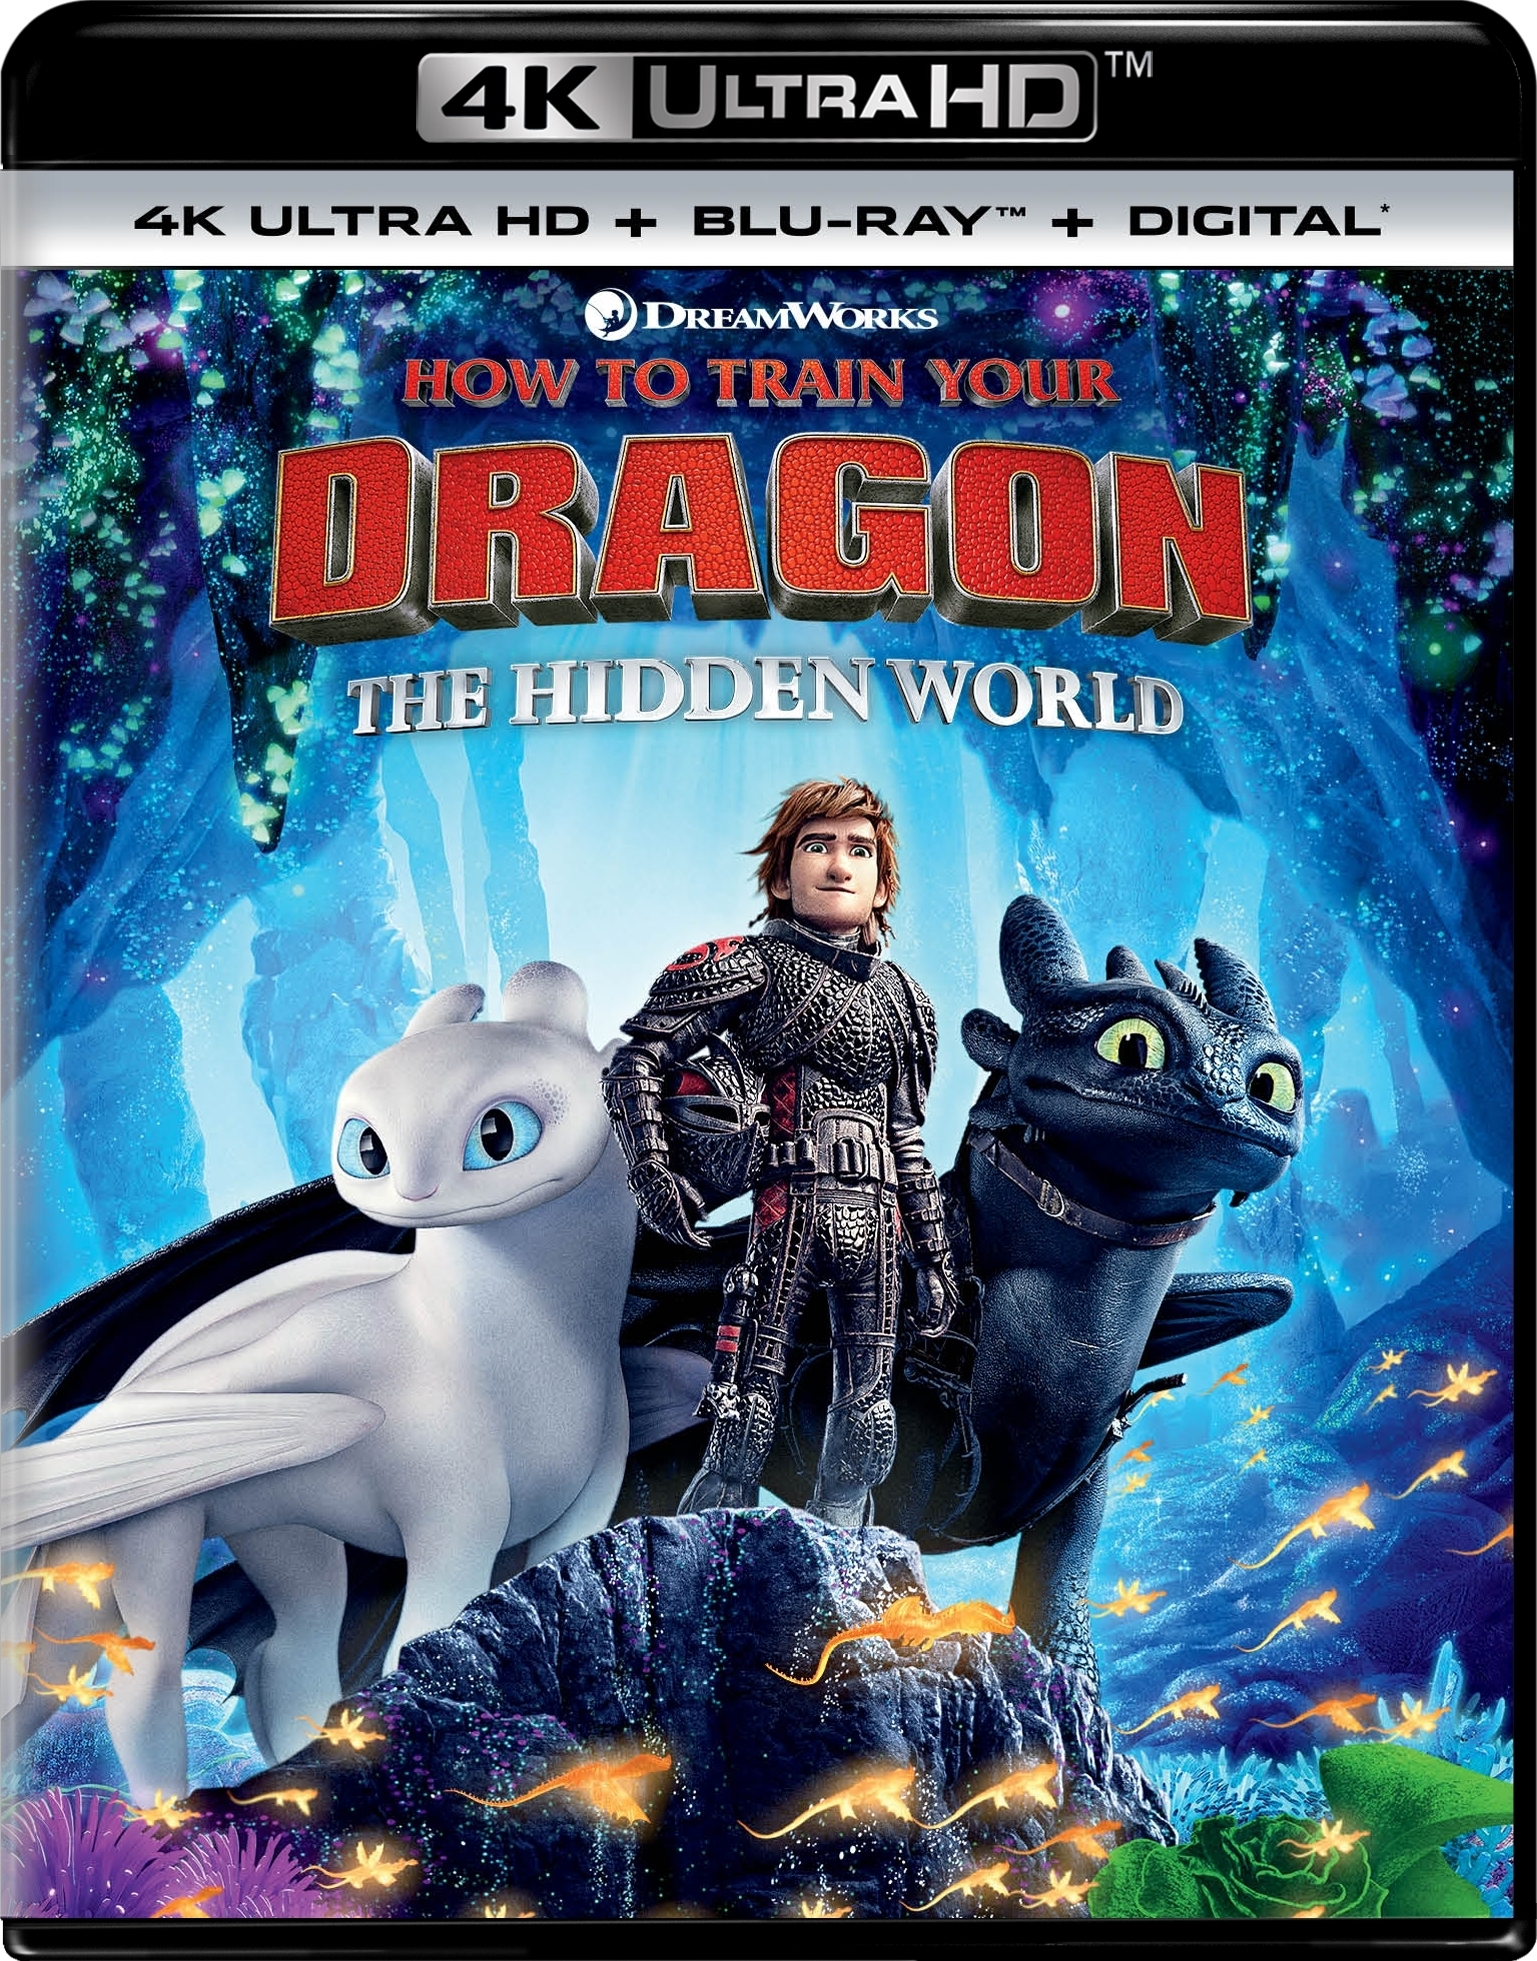 How to Train Your Dragon 3: The Hidden World (4K Ultra HD Blu-ray)